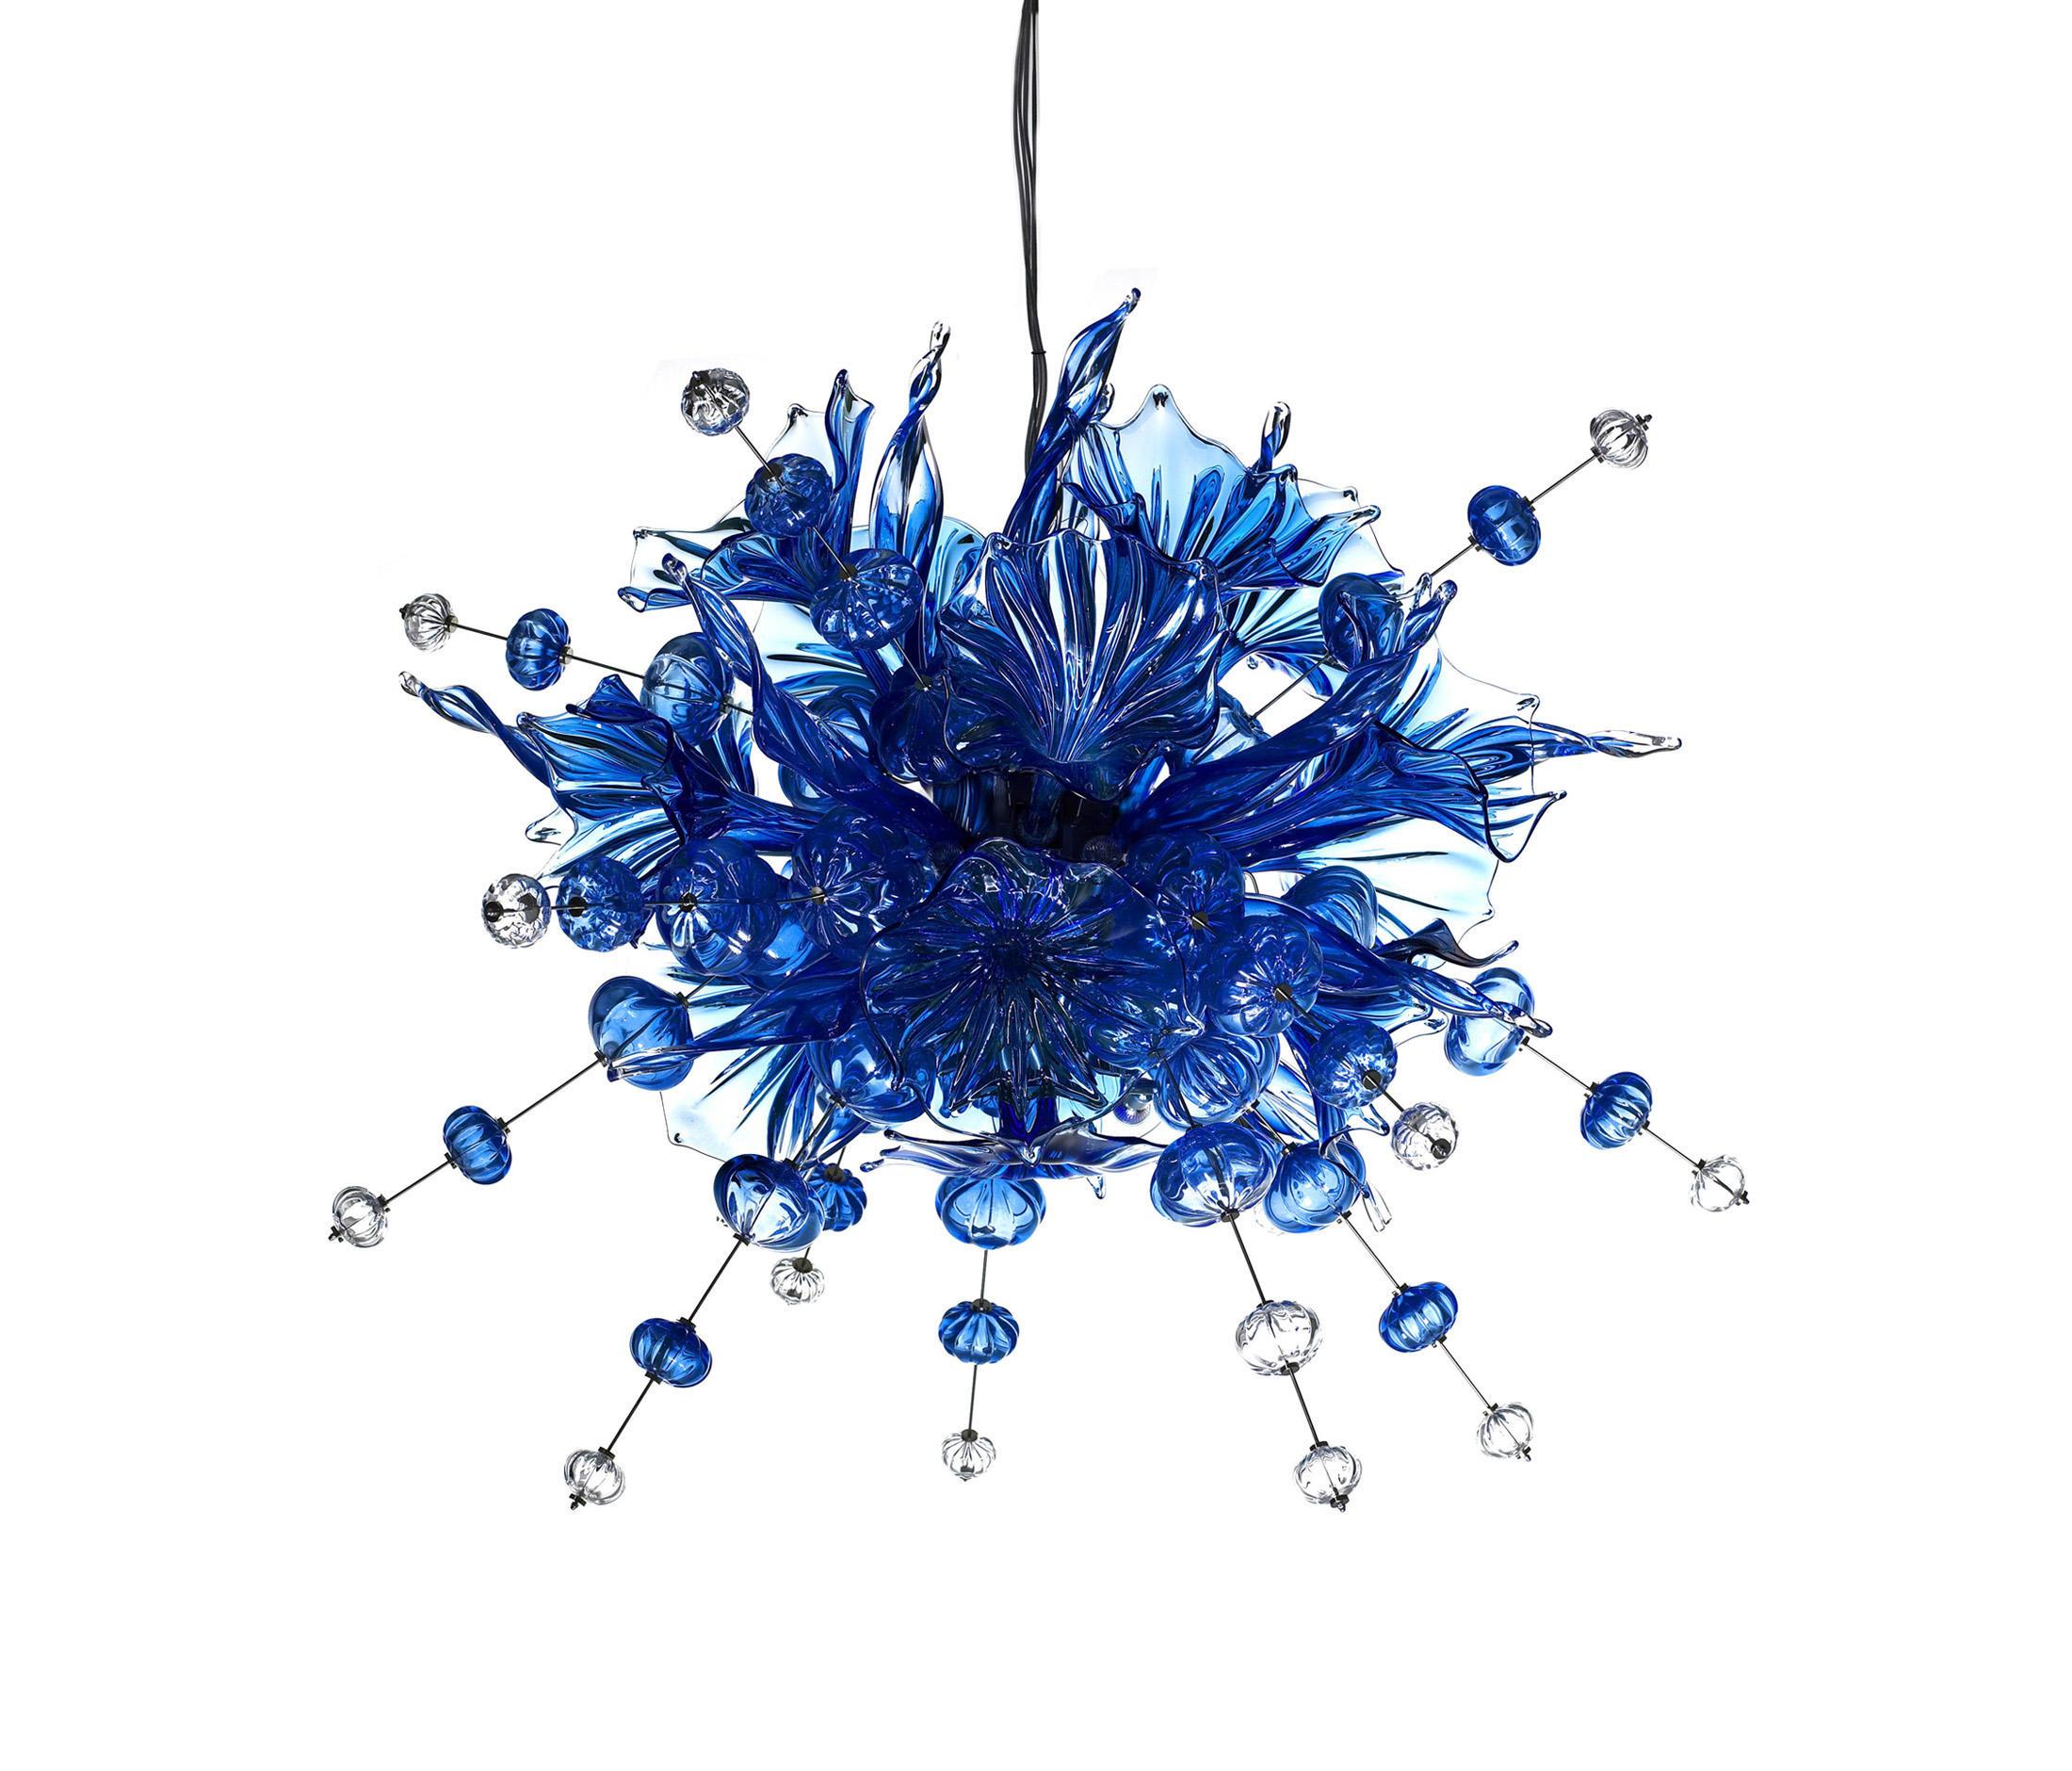 KUMULUS 120 CHANDELIER BLUE - General lighting from Bsweden ...